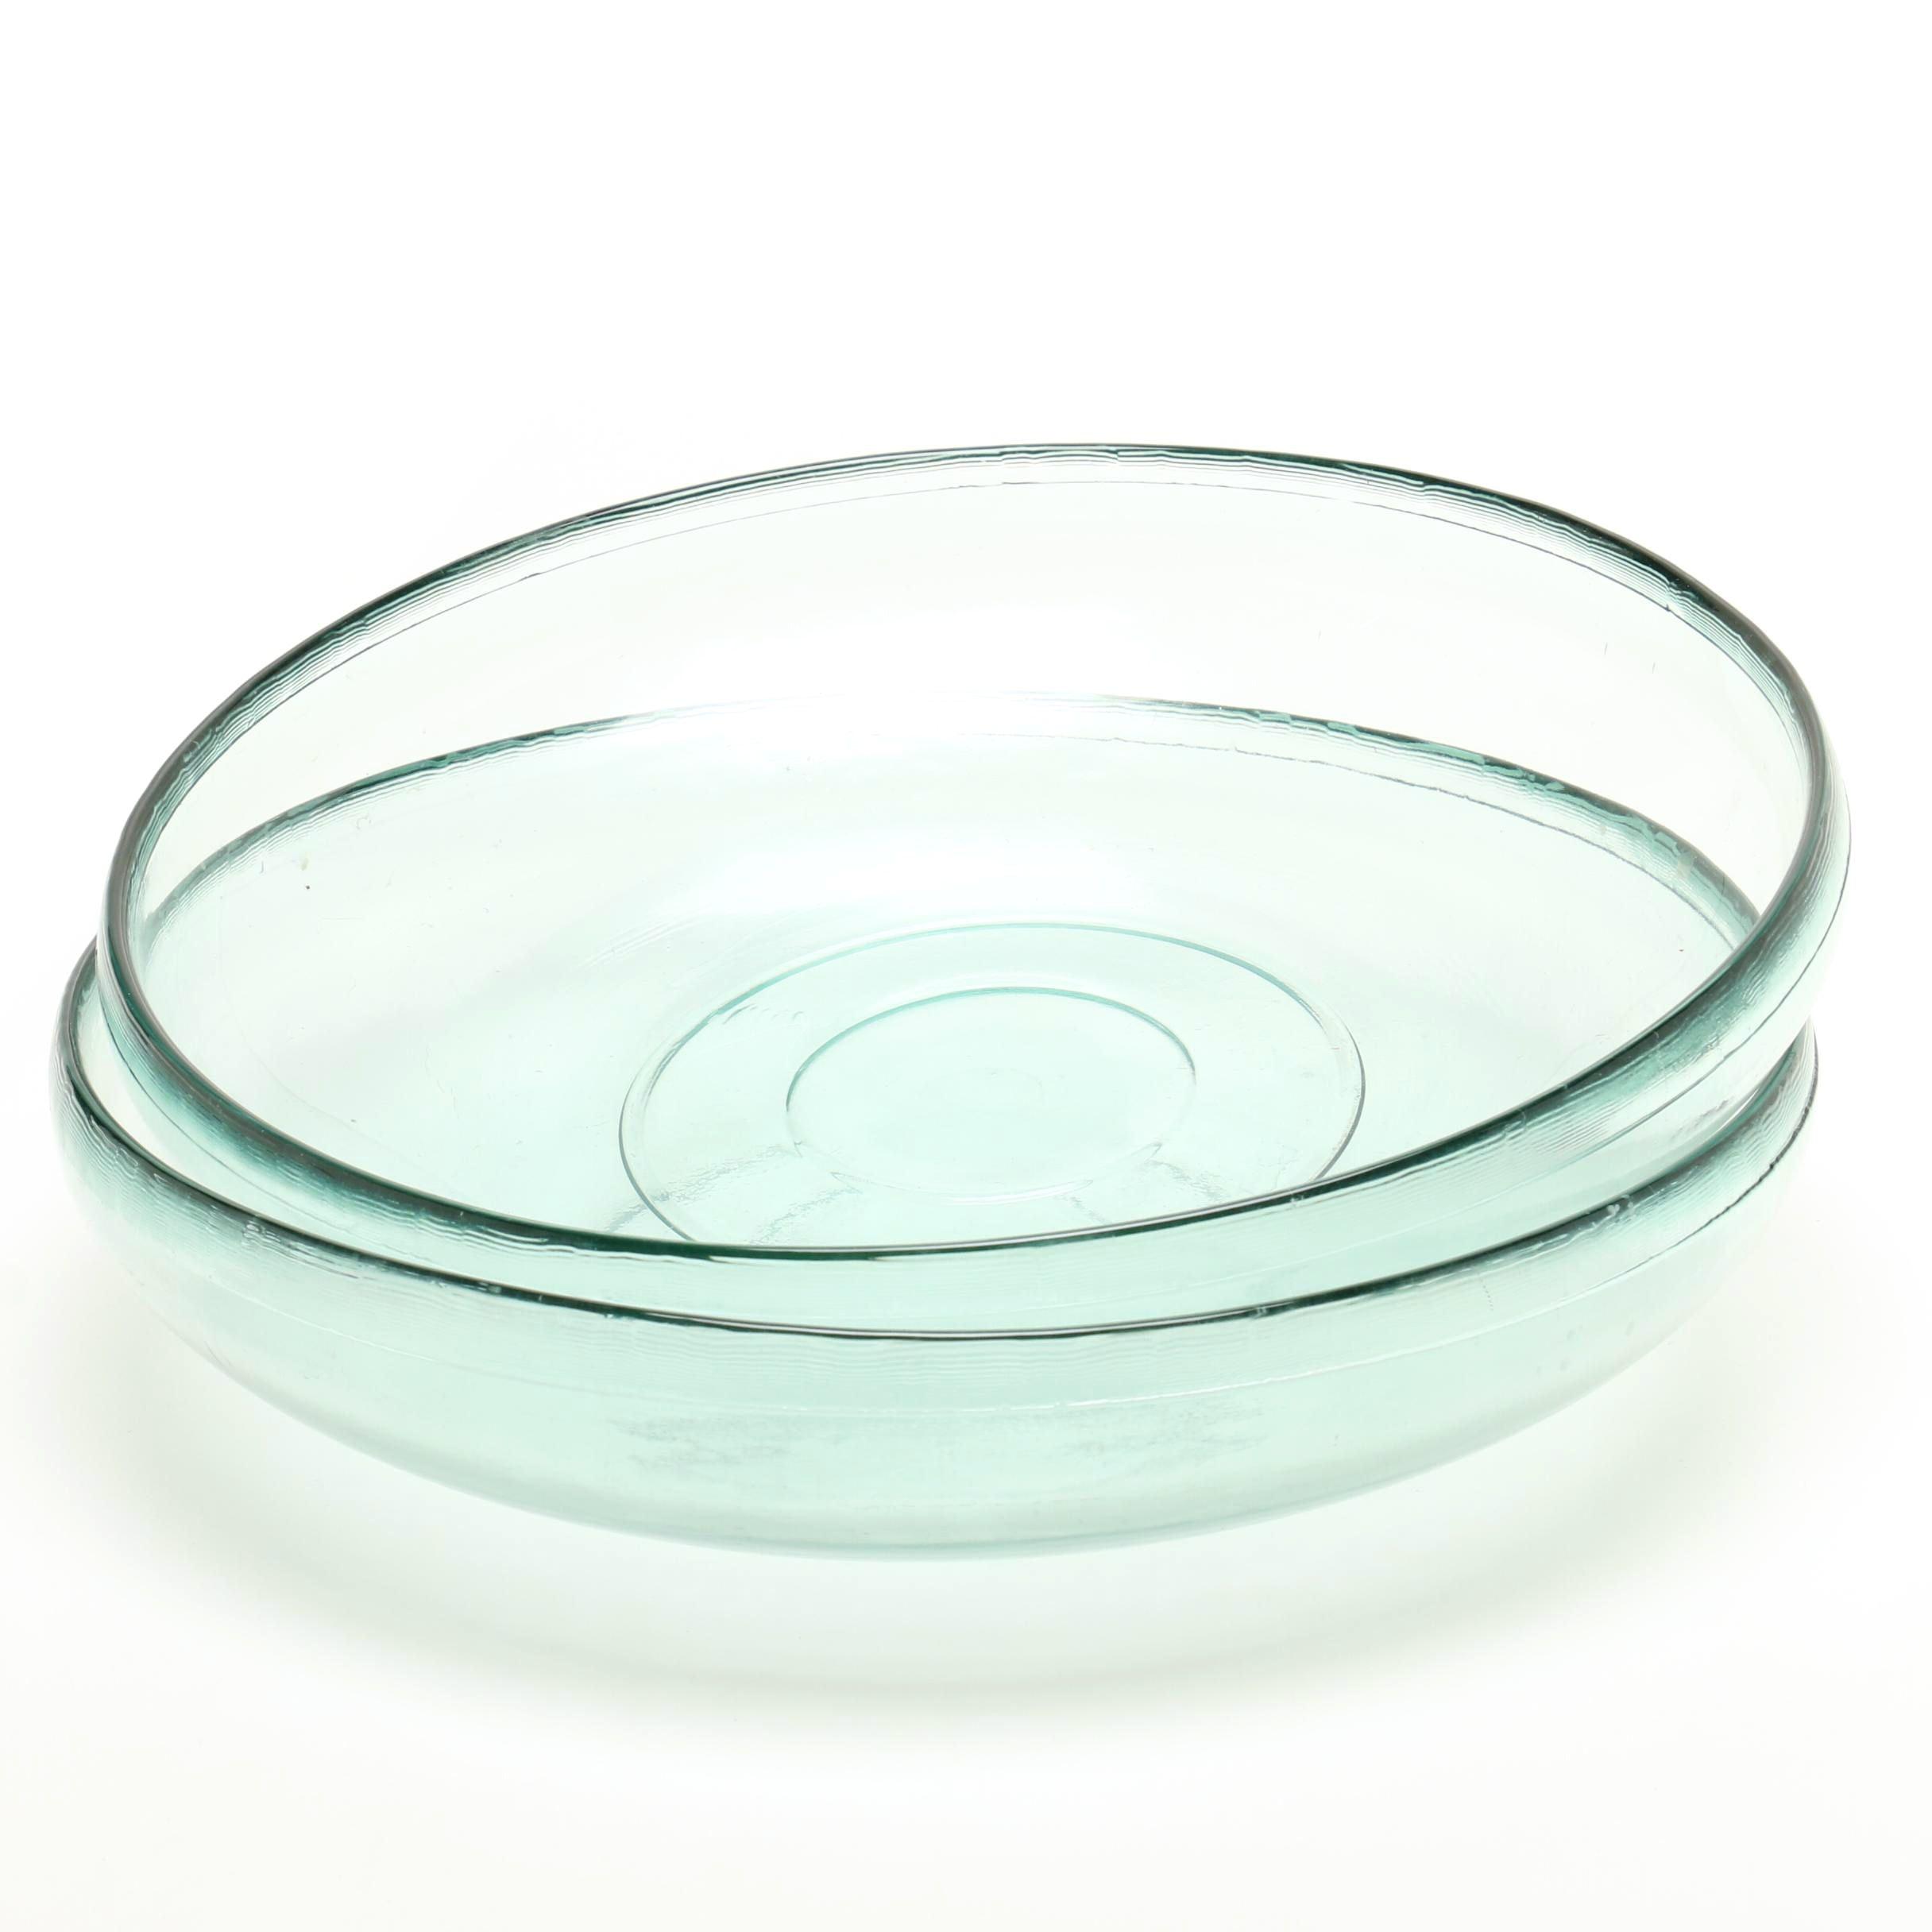 Wide Glass Serving Dish Set